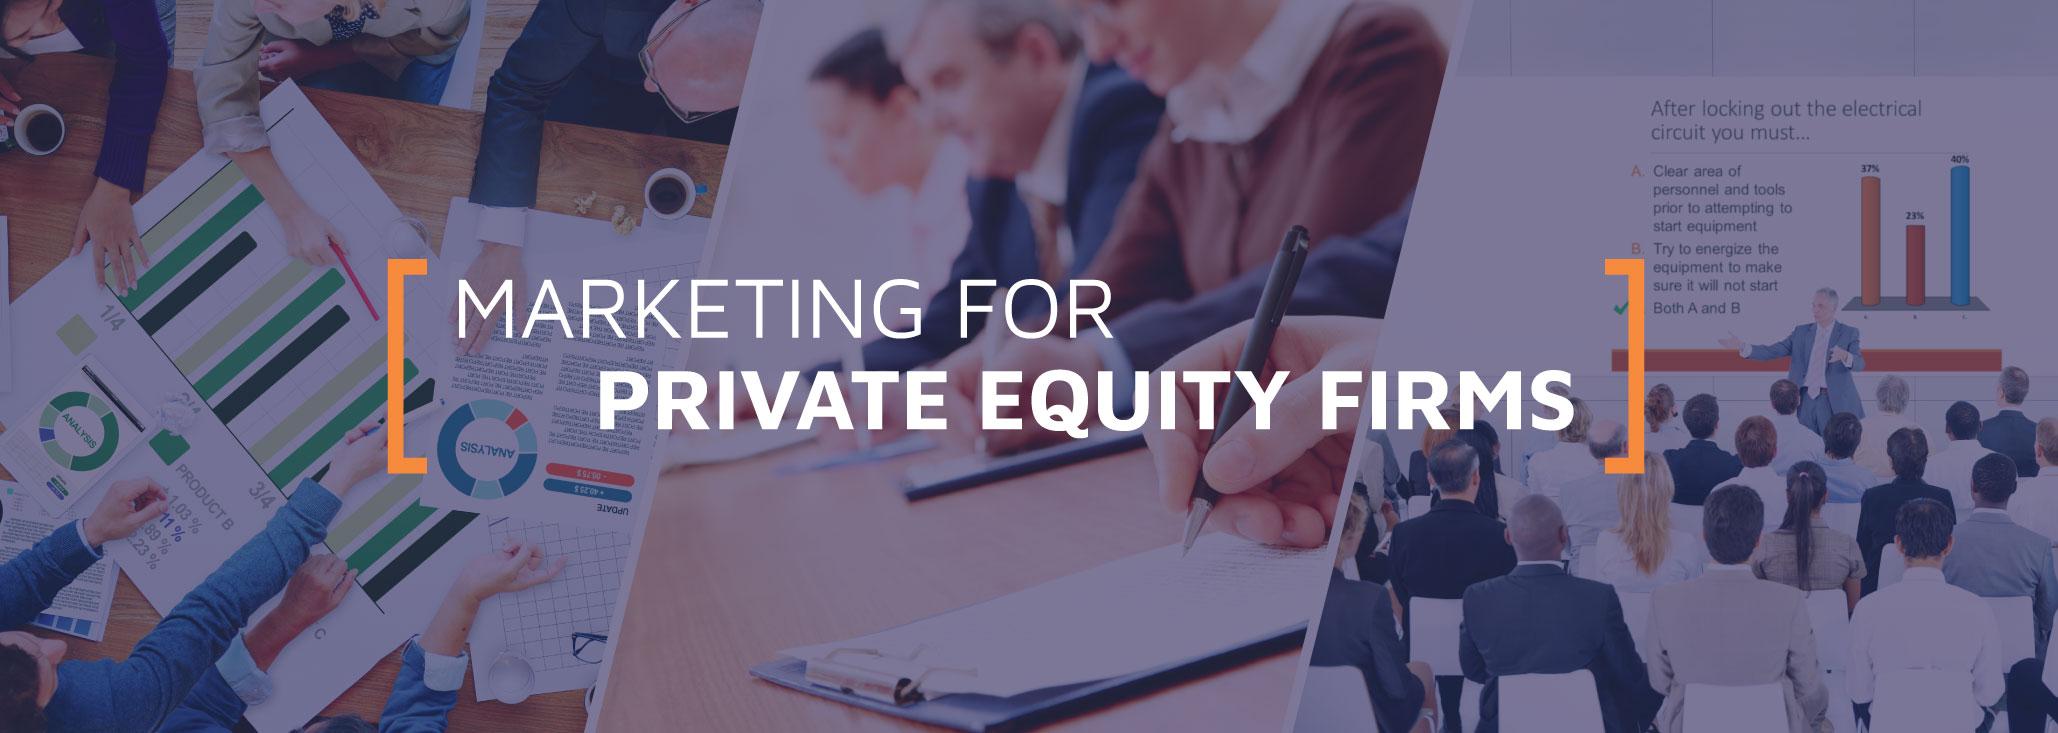 PrivateEquityFirmsVert